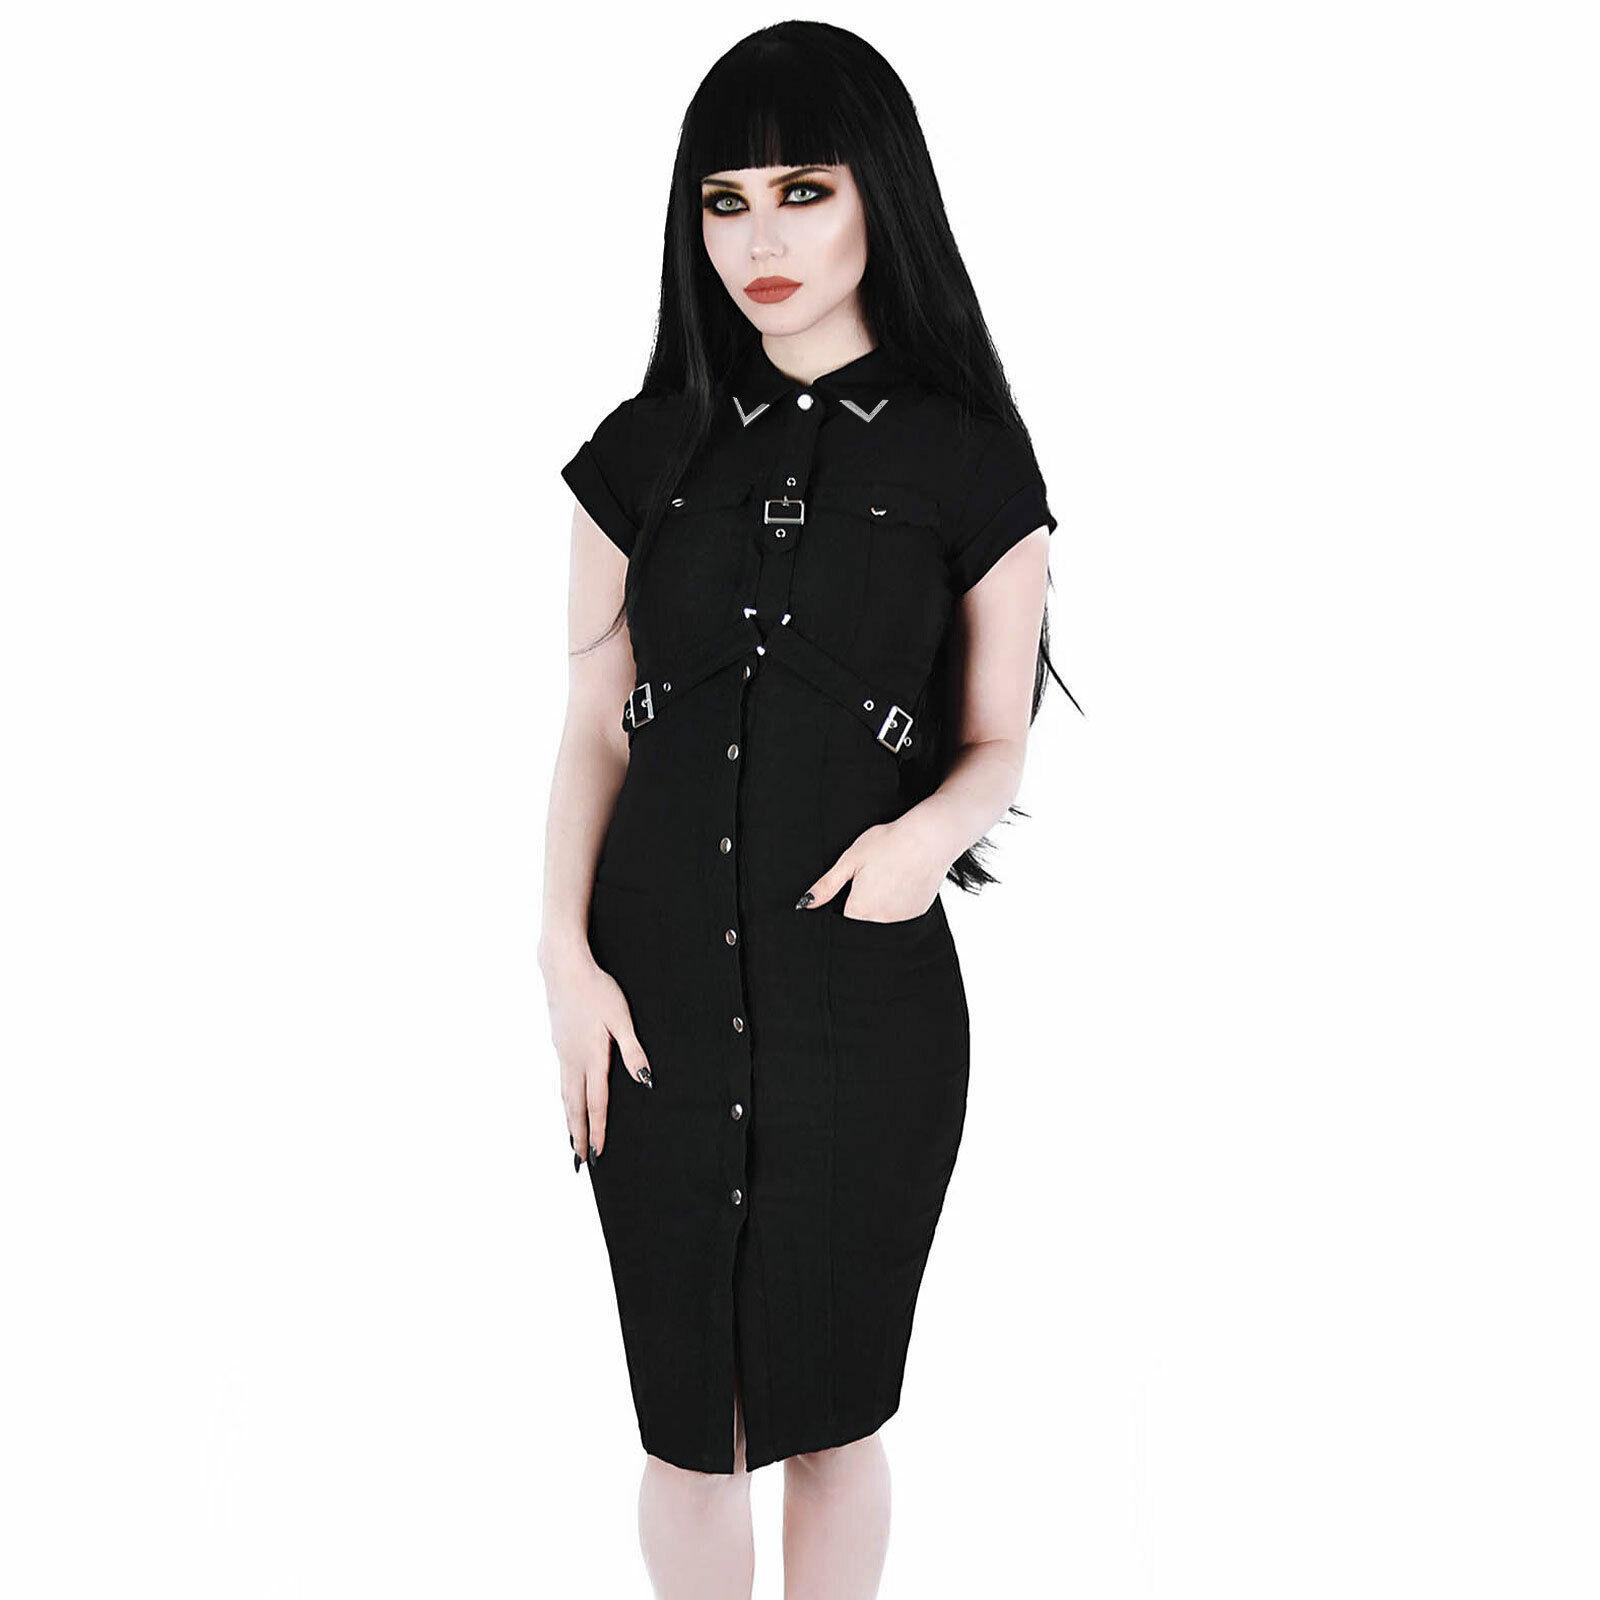 KILLSTAR Force Field Harness Dress Gothic Kleid Uniform Schwarz Snap-front